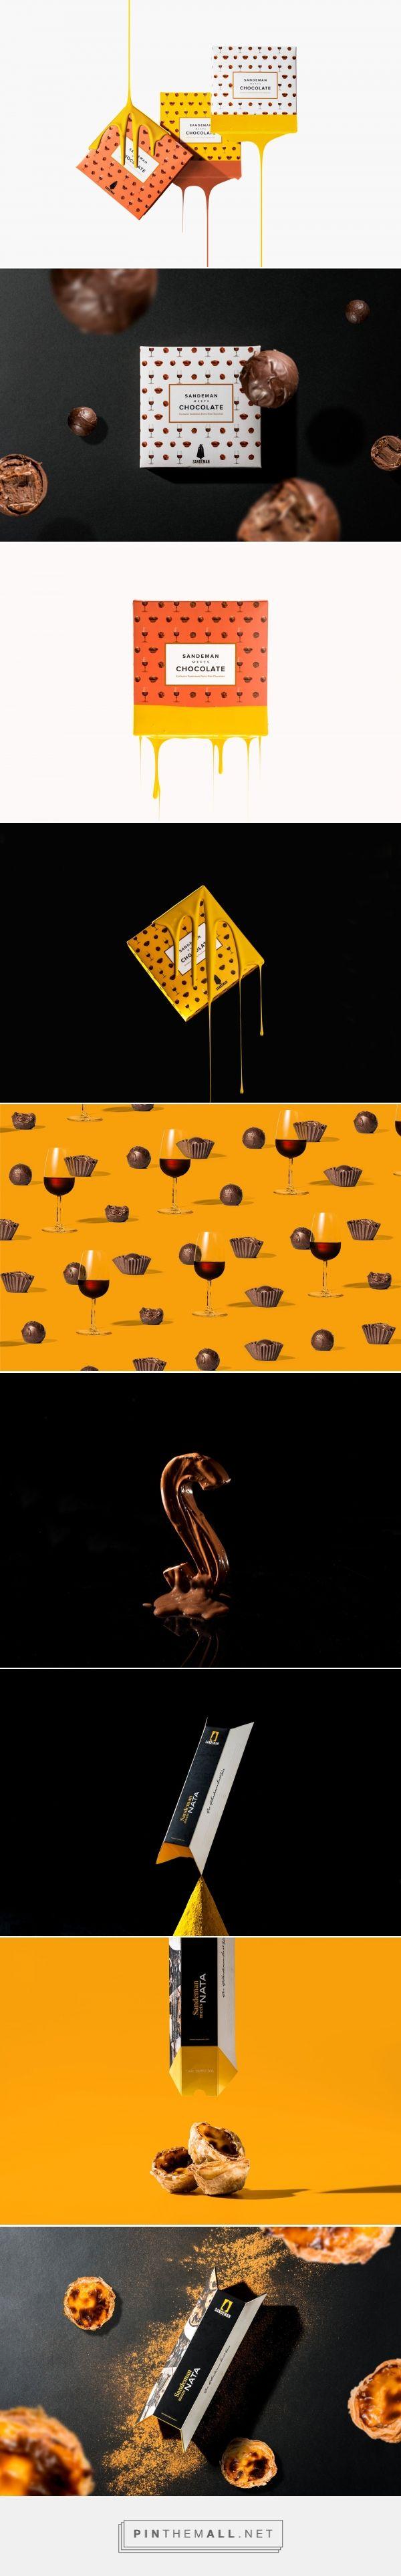 Sandeman Meets Chocolate packaging design by VOLTA - http://www.packagingoftheworld.com/2017/05/sandeman-meets.html